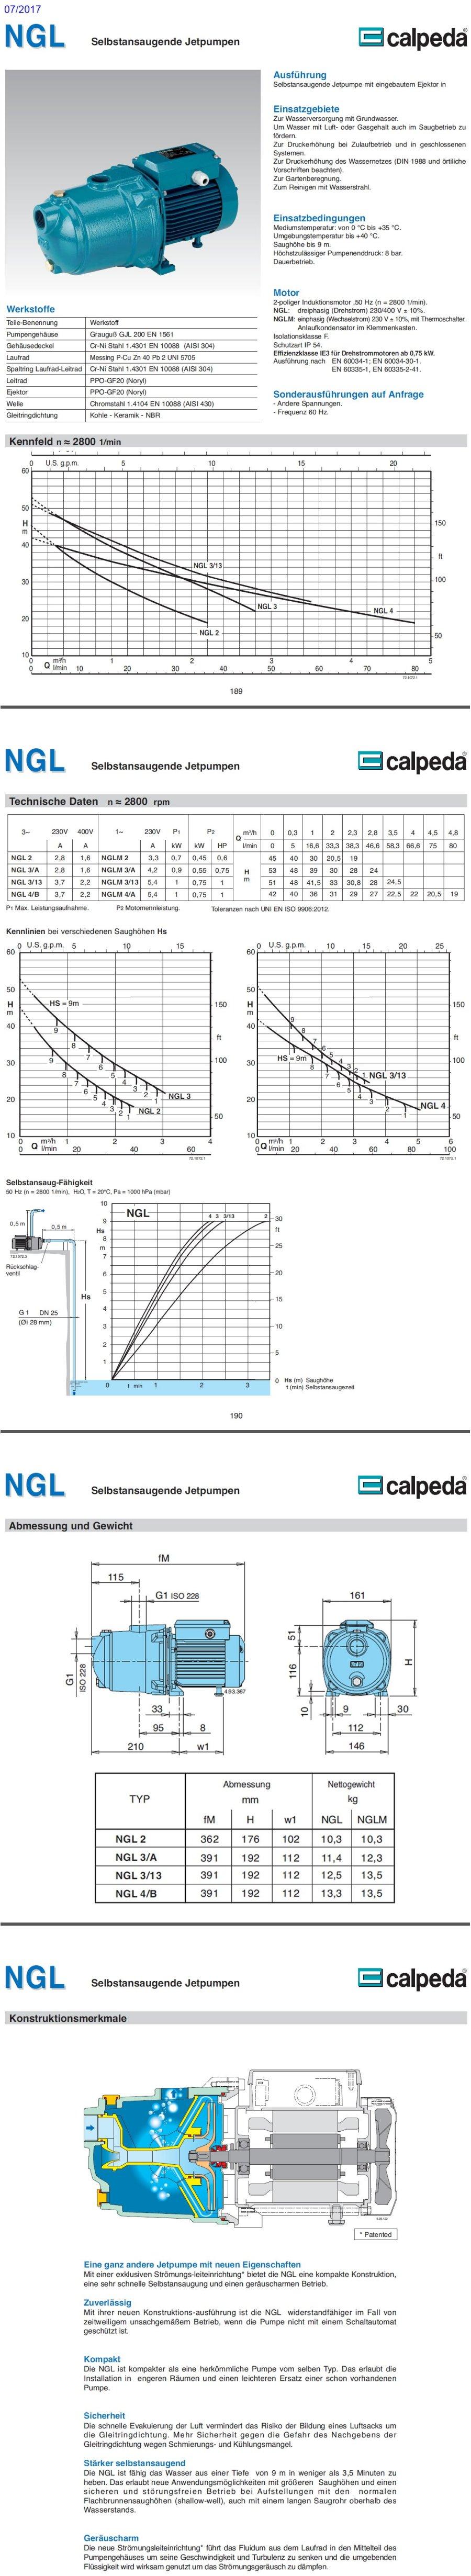 Selbstansaugende Jetpumpe CALPEDA NGL4m//A 0,75kW 1Hp Einzelphase 230V NGLM